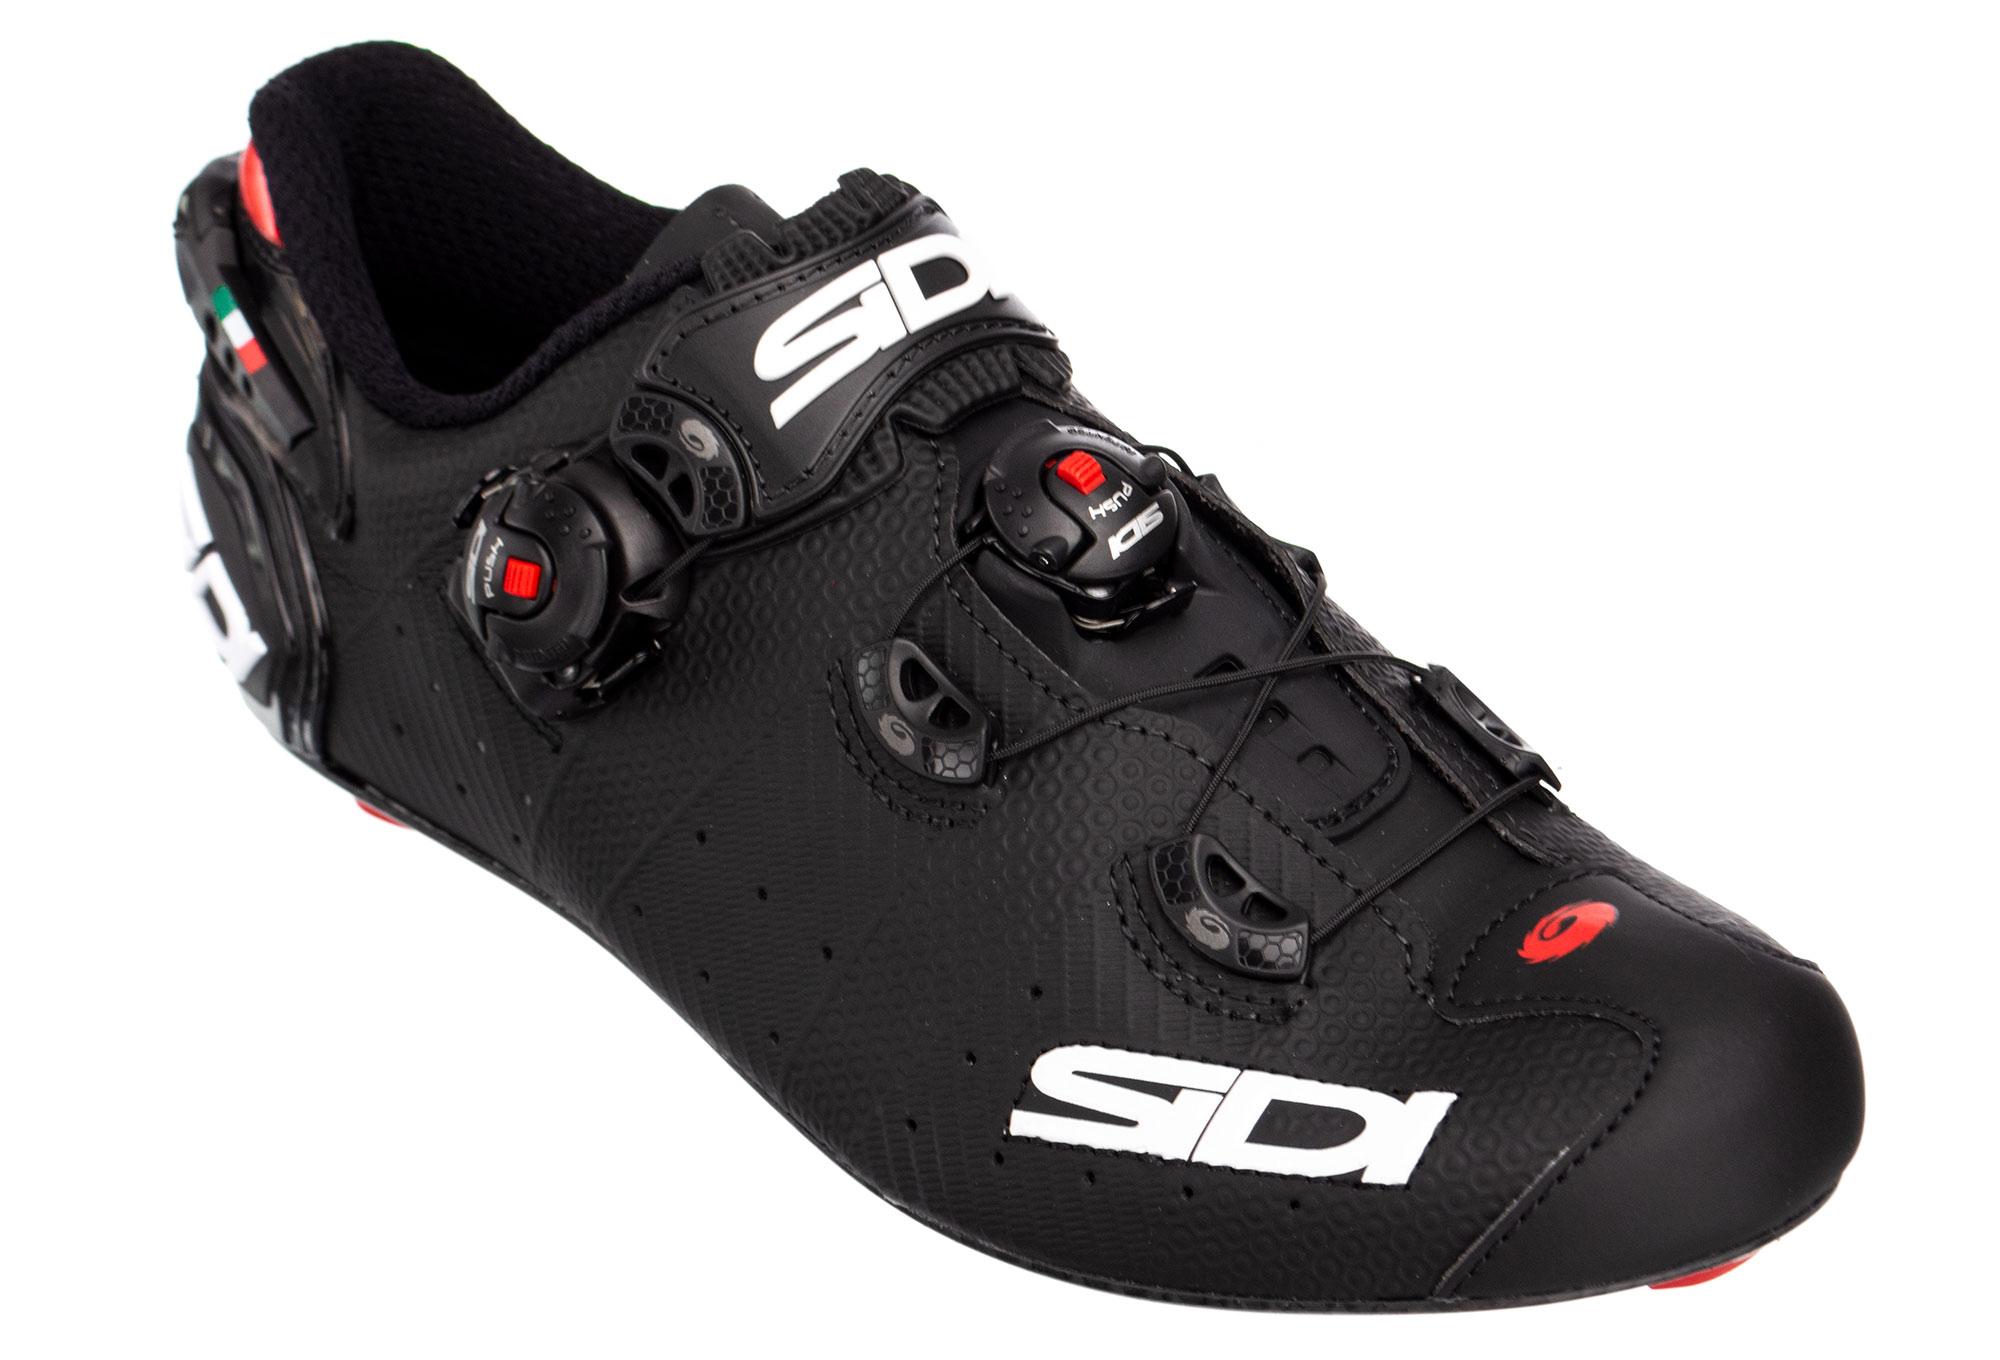 0ceb8de8e1 Sidi Wire 2 Carbon Road Shoes Matte Black | Alltricks.com